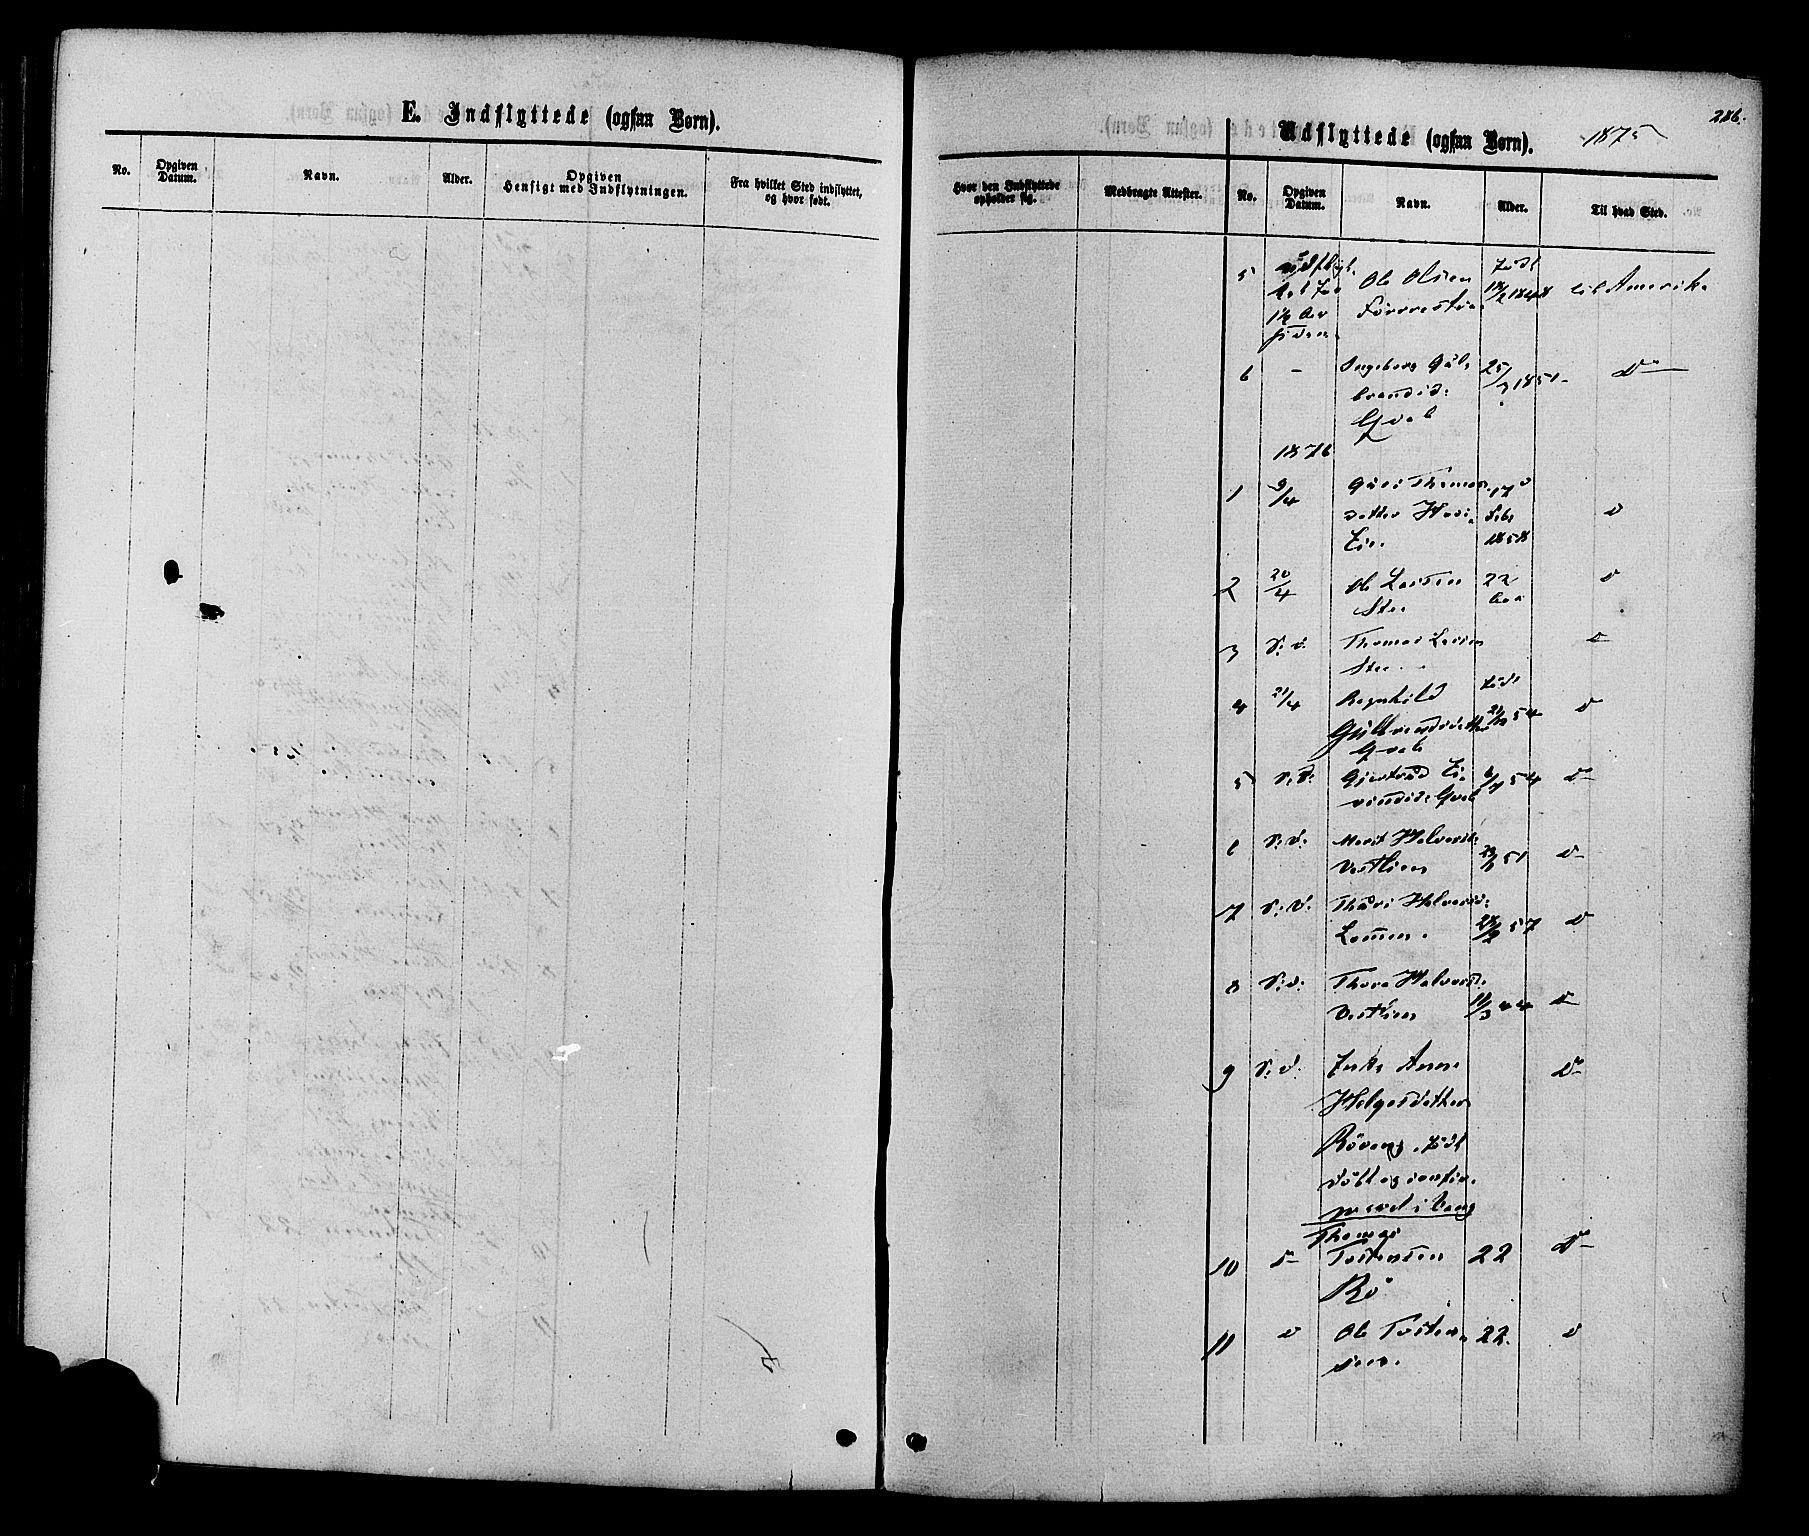 SAH, Vestre Slidre prestekontor, Ministerialbok nr. 3, 1865-1880, s. 286